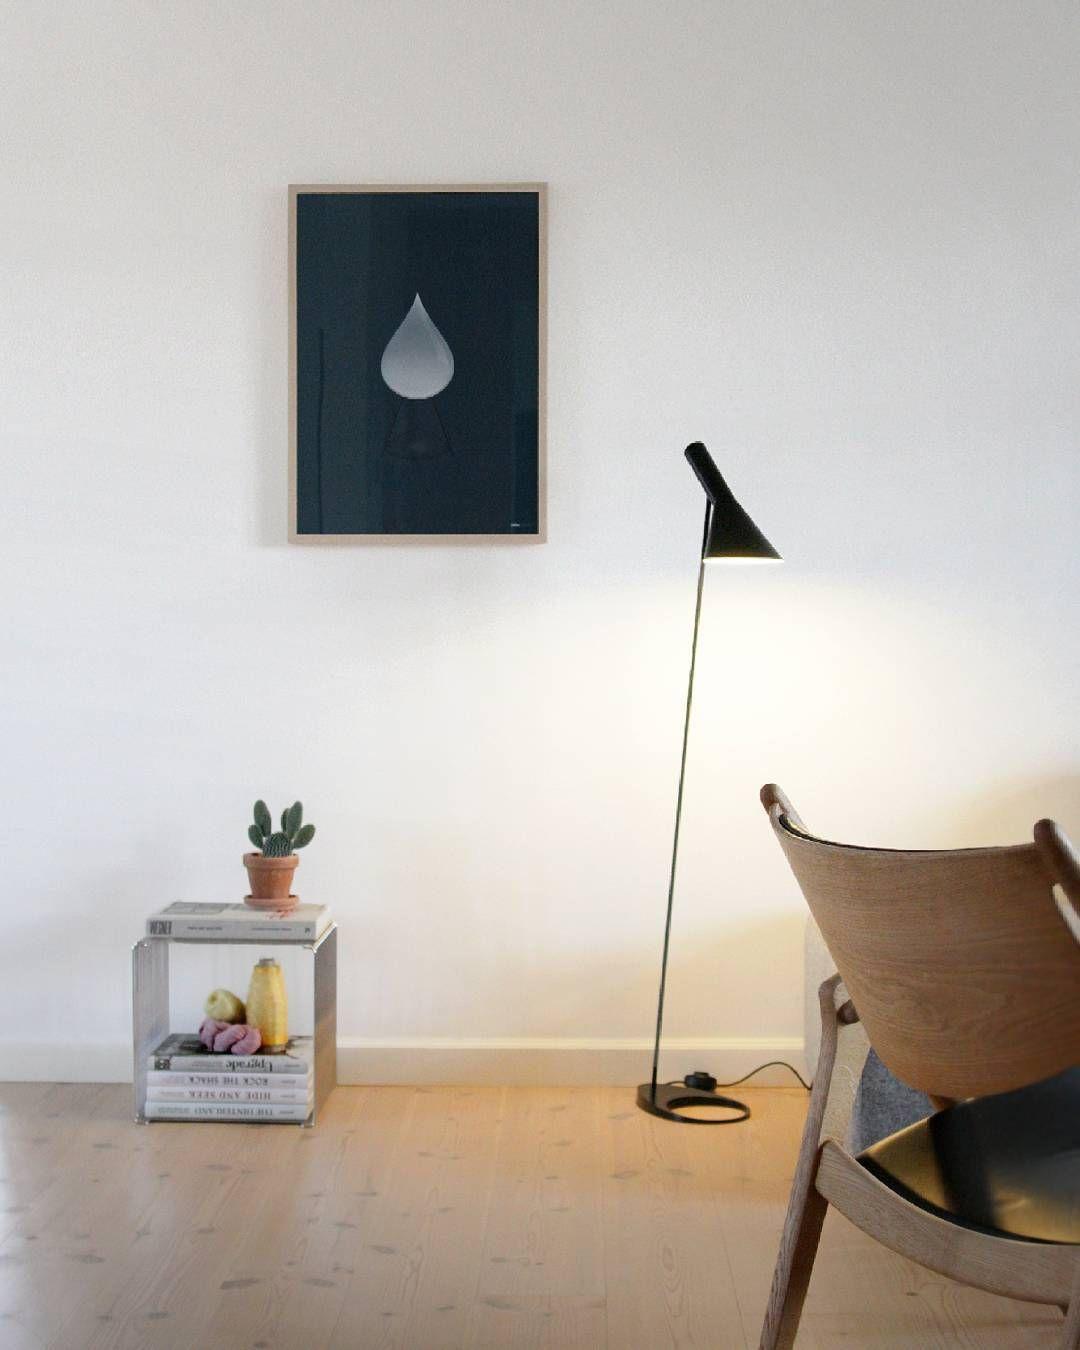 Draben Hos Pernille M L Brainchildoriginal Danskdesign Tilbagetiloriginalen Draben Drabe Nytmotiv Svanen Aegget Koglen In 2020 Home Decor Decor Furniture